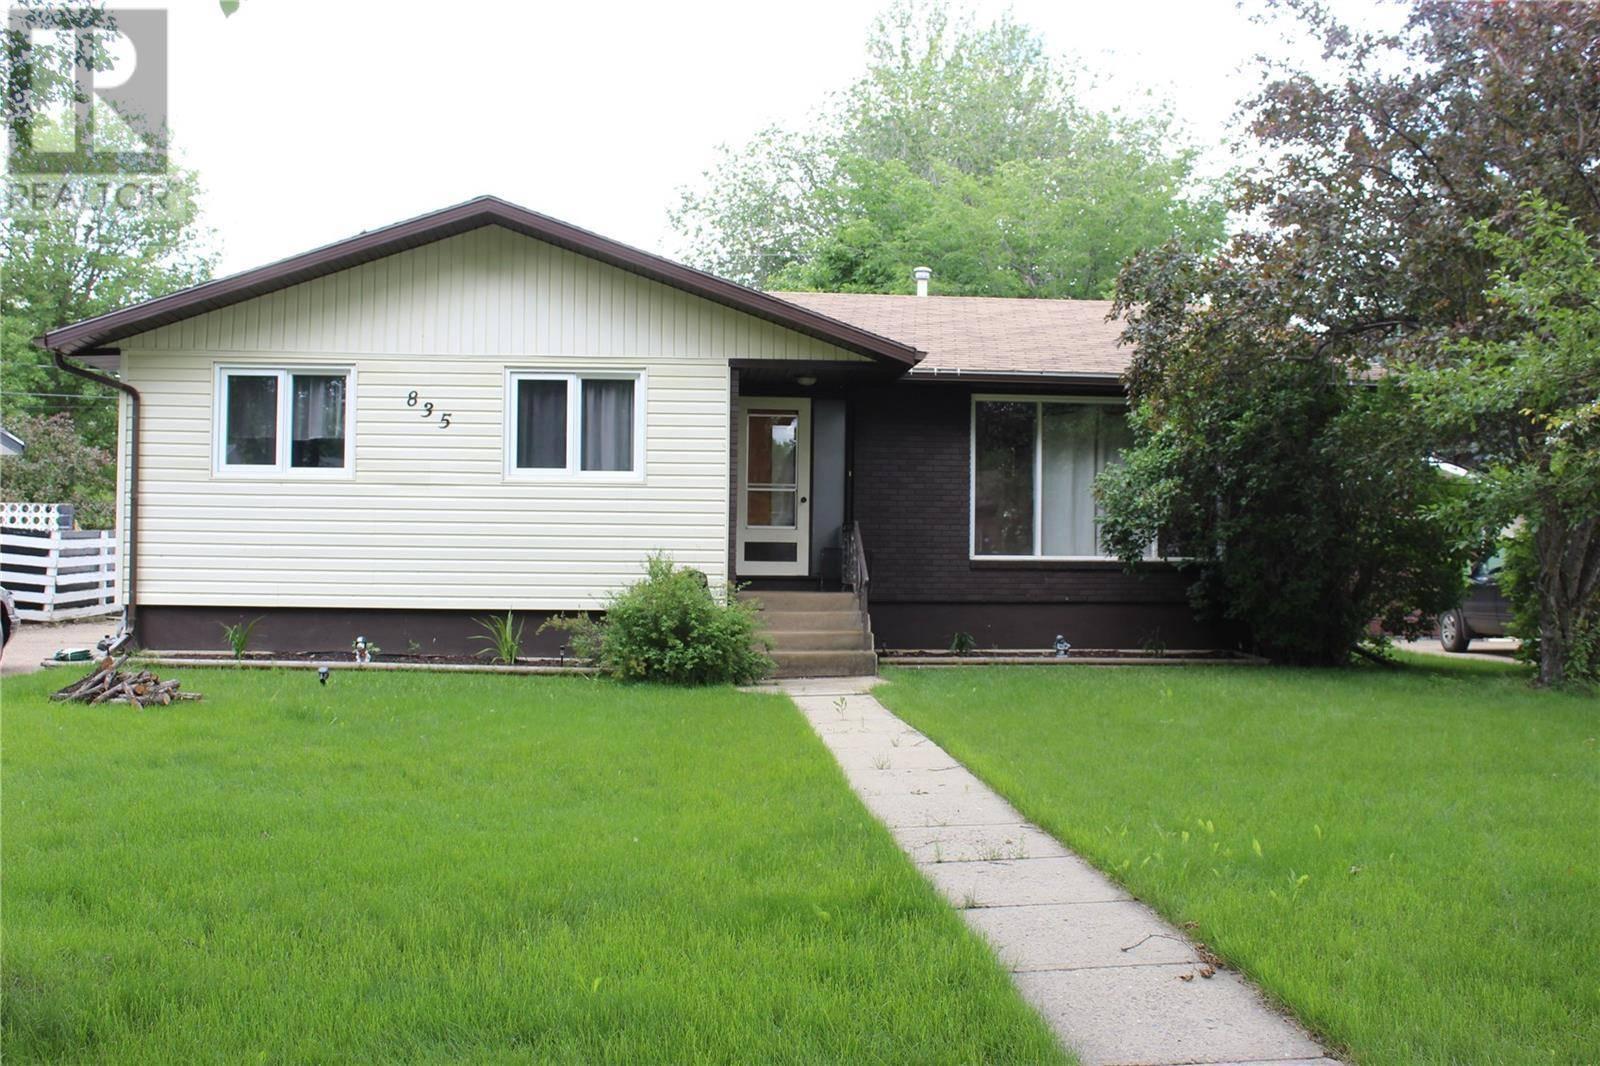 House for sale at 835 3rd St E Shaunavon Saskatchewan - MLS: SK760086